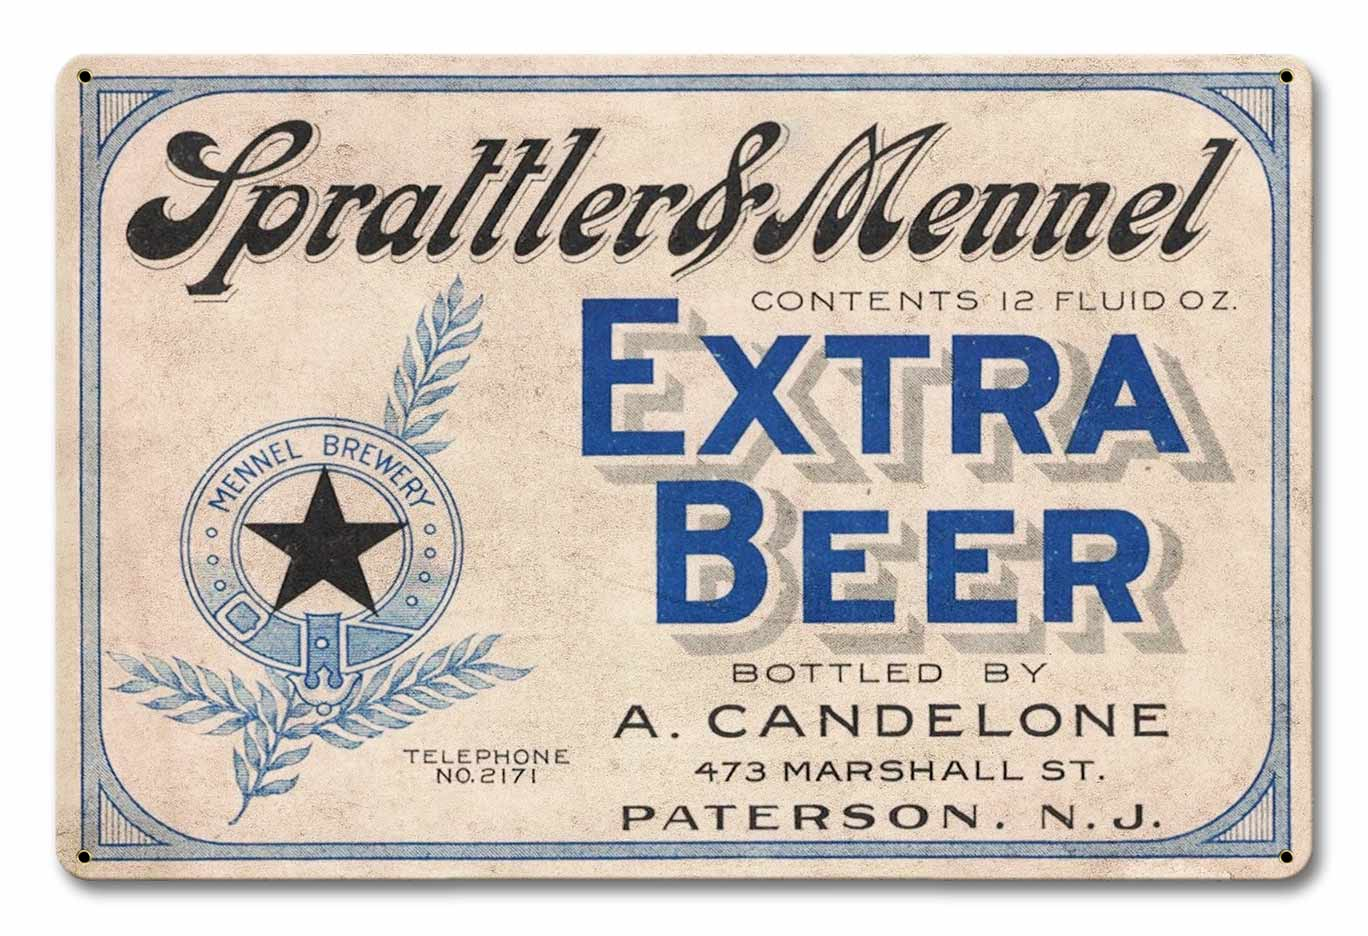 Spattler & Mennel Extra Beer